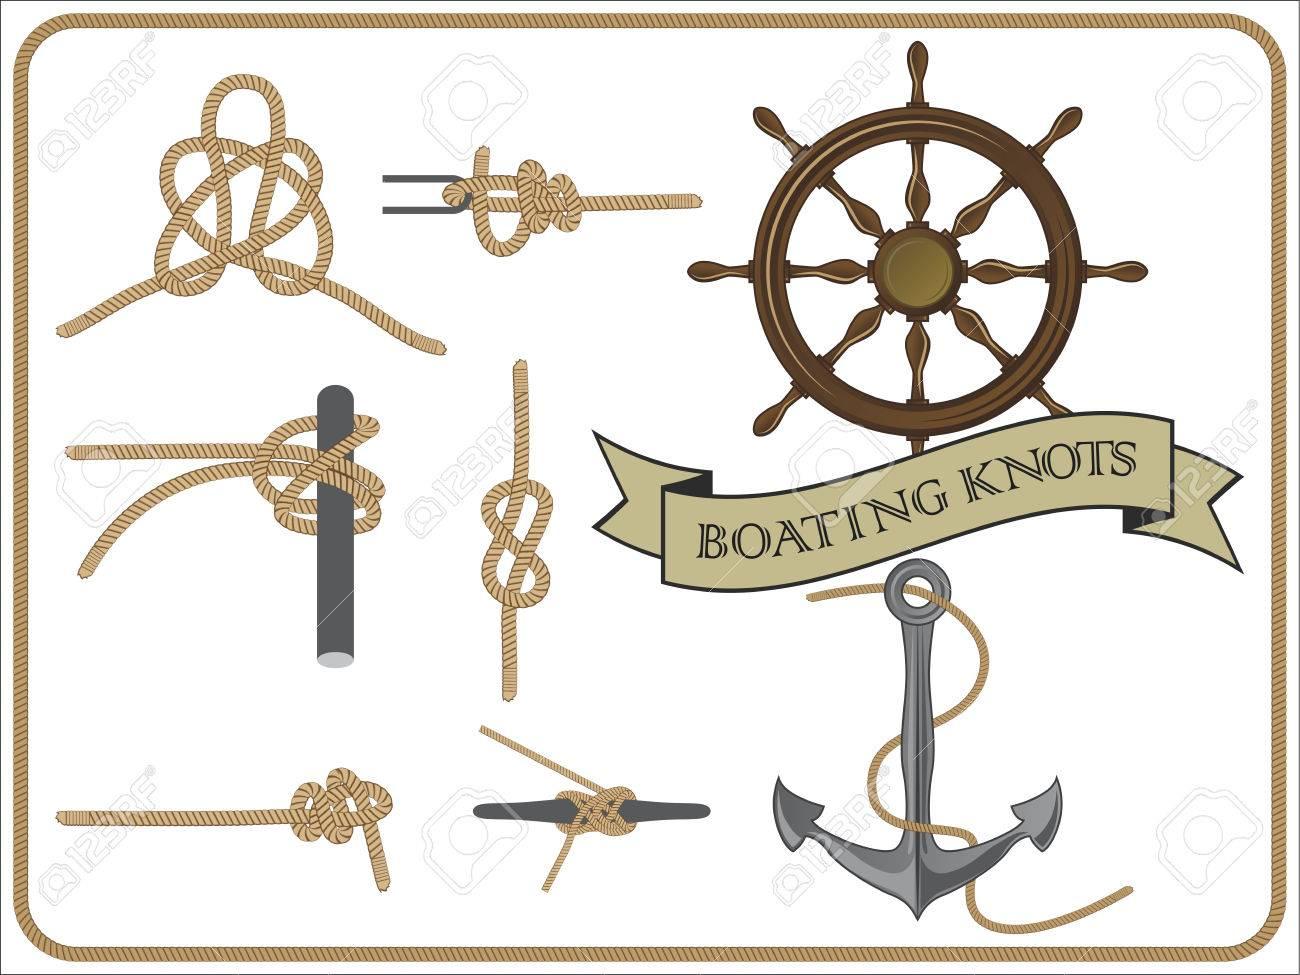 isolated set of boating knots on white background - 74190538